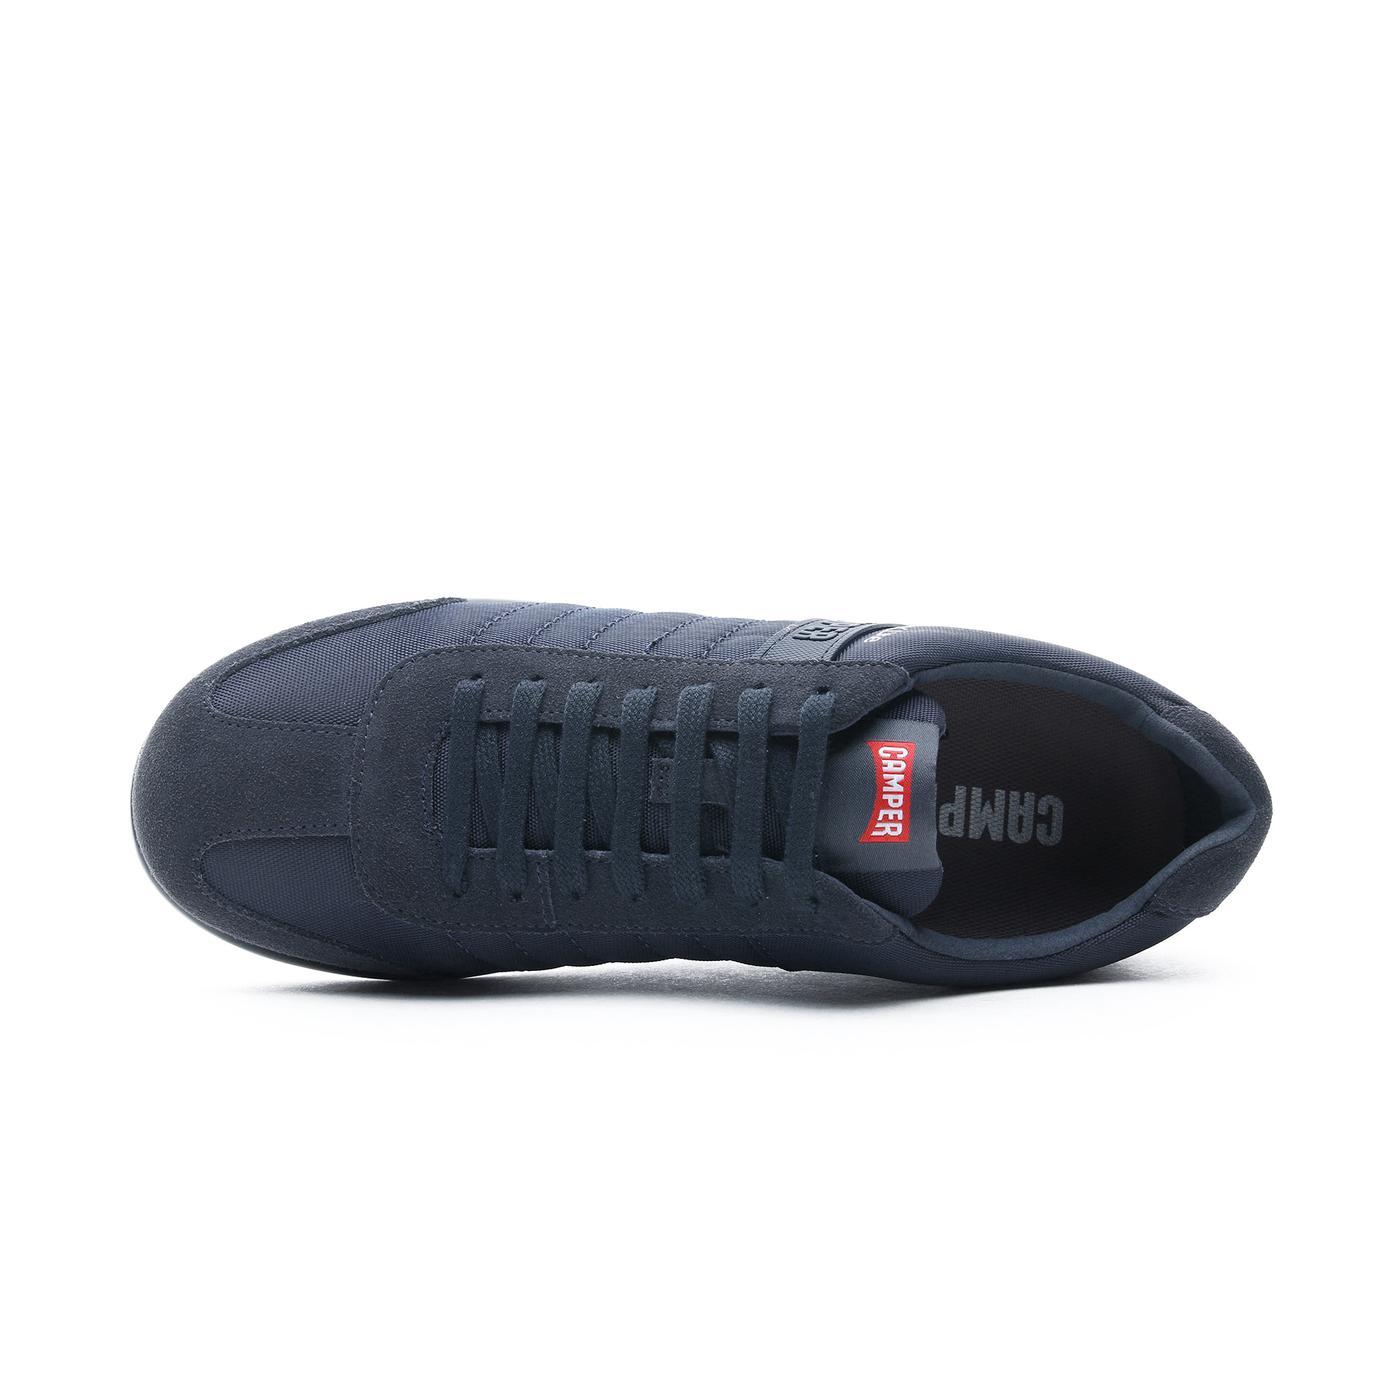 Camper Pelotas XL Erkek Lacivert Spor Ayakkabı